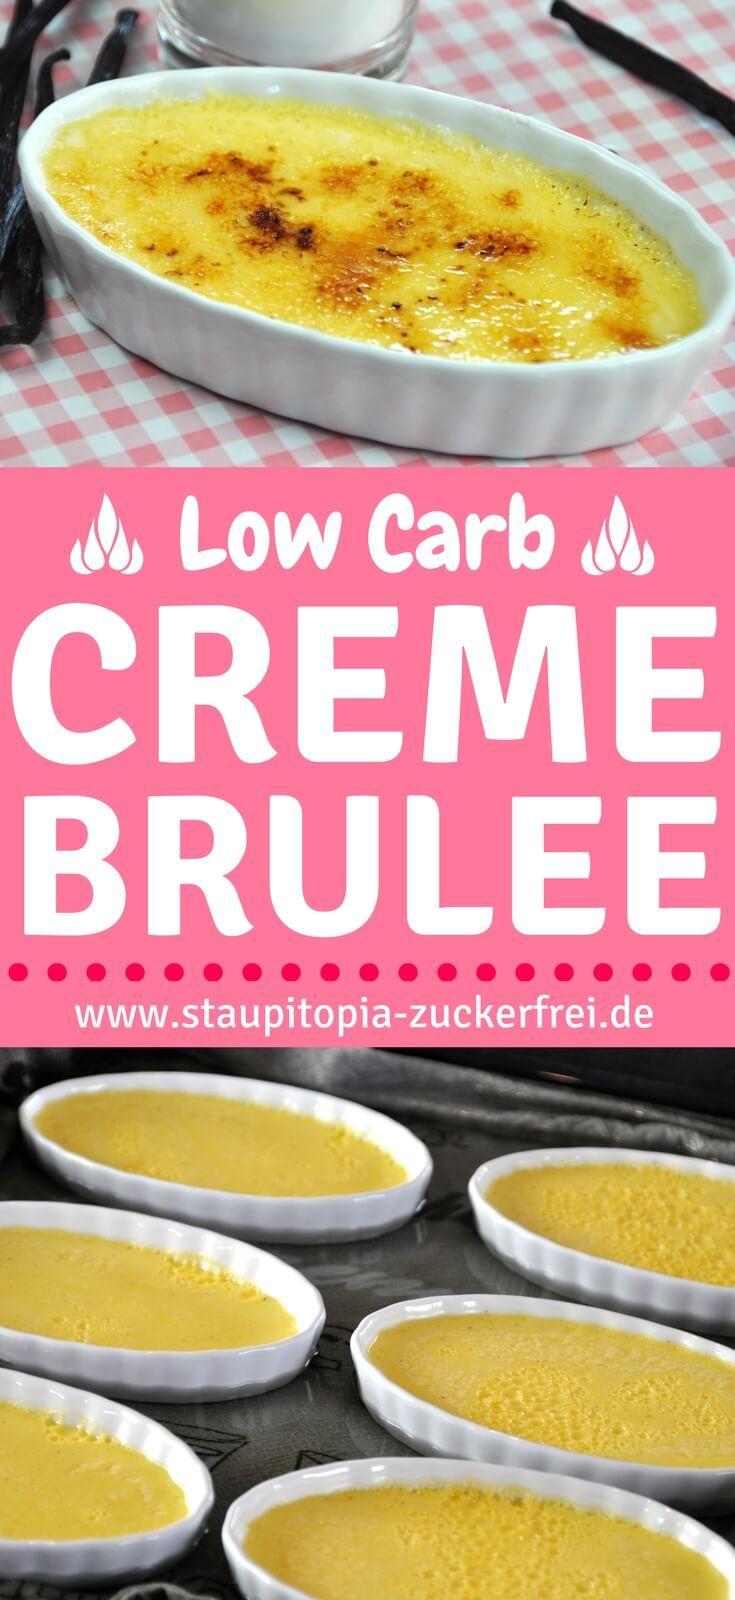 low carb creme brulee rezept staupitopia zuckerfrei rezepte tipps low carb rezepte. Black Bedroom Furniture Sets. Home Design Ideas